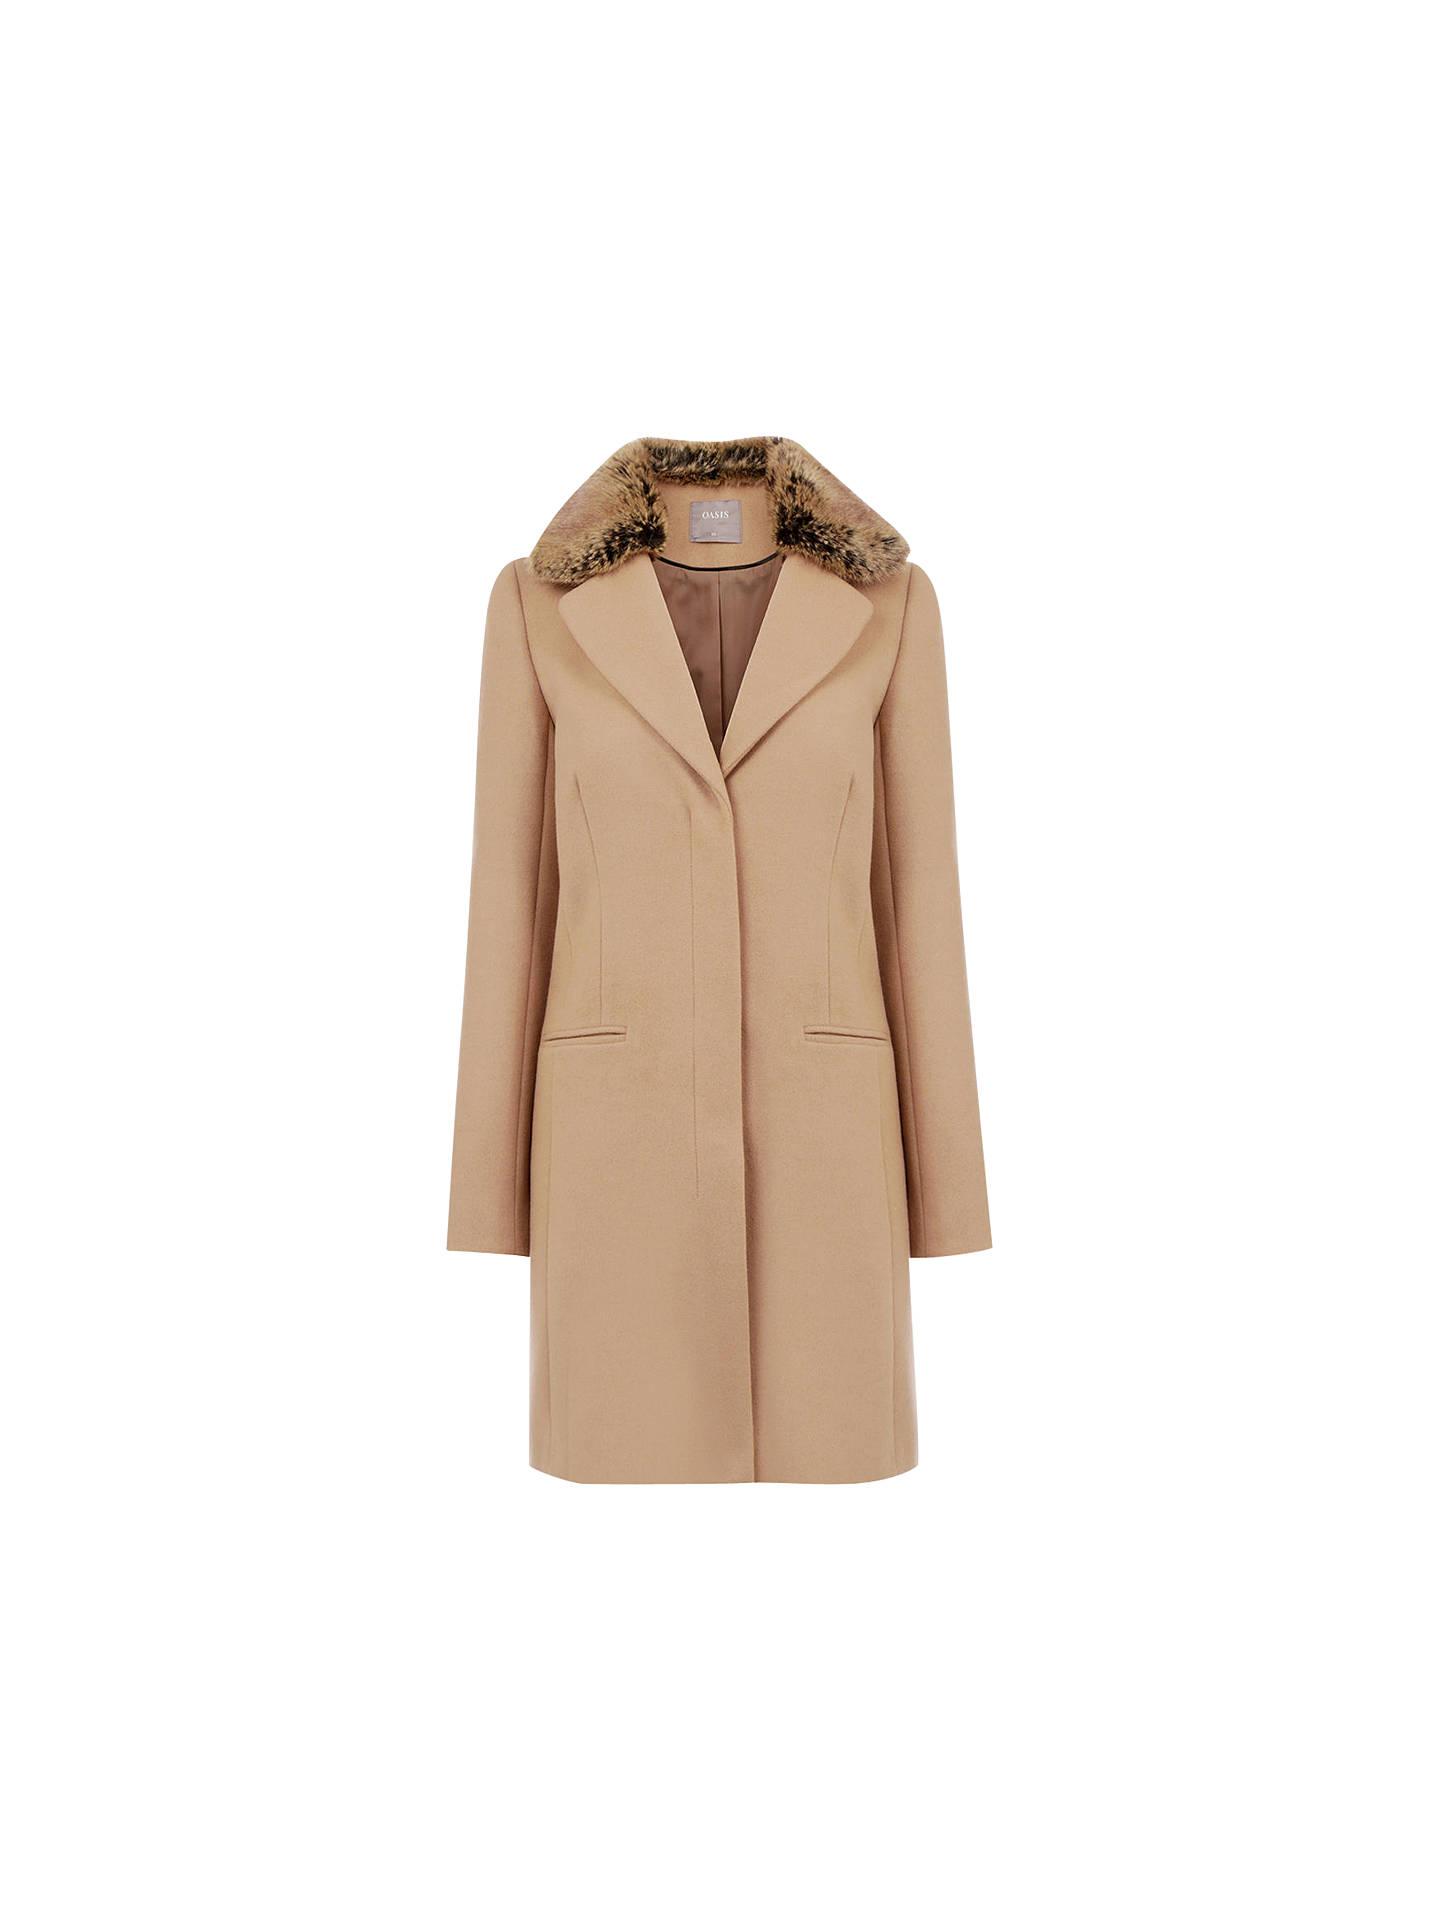 9cf921ba51fe Buy Oasis Felicity Formal Faux Fur Collar Coat, Camel, XS Online at  johnlewis.